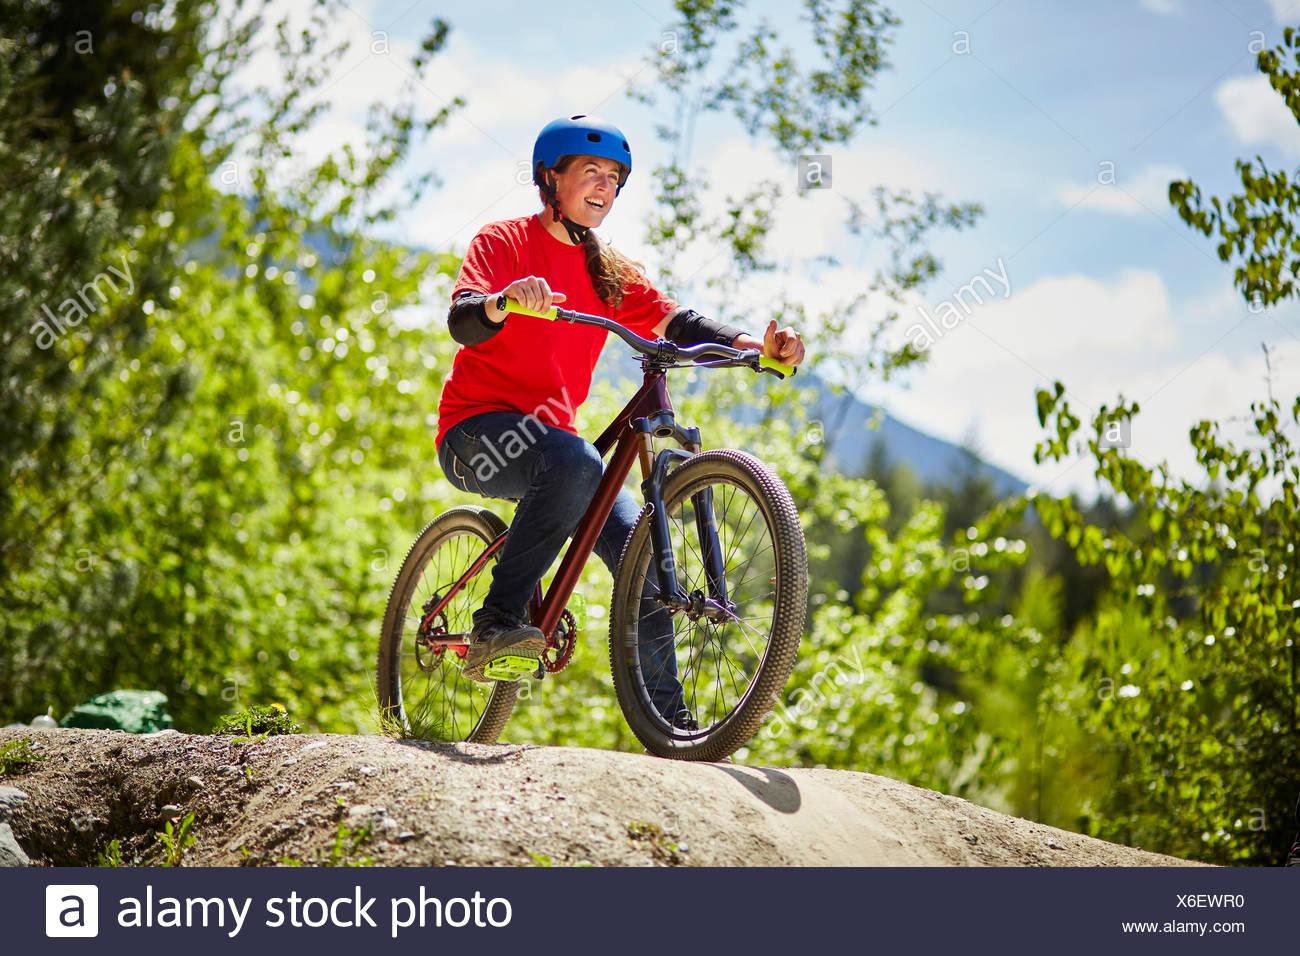 Hembra joven ciclista de BMX preparada en el borde de la roca en el bosque Imagen De Stock